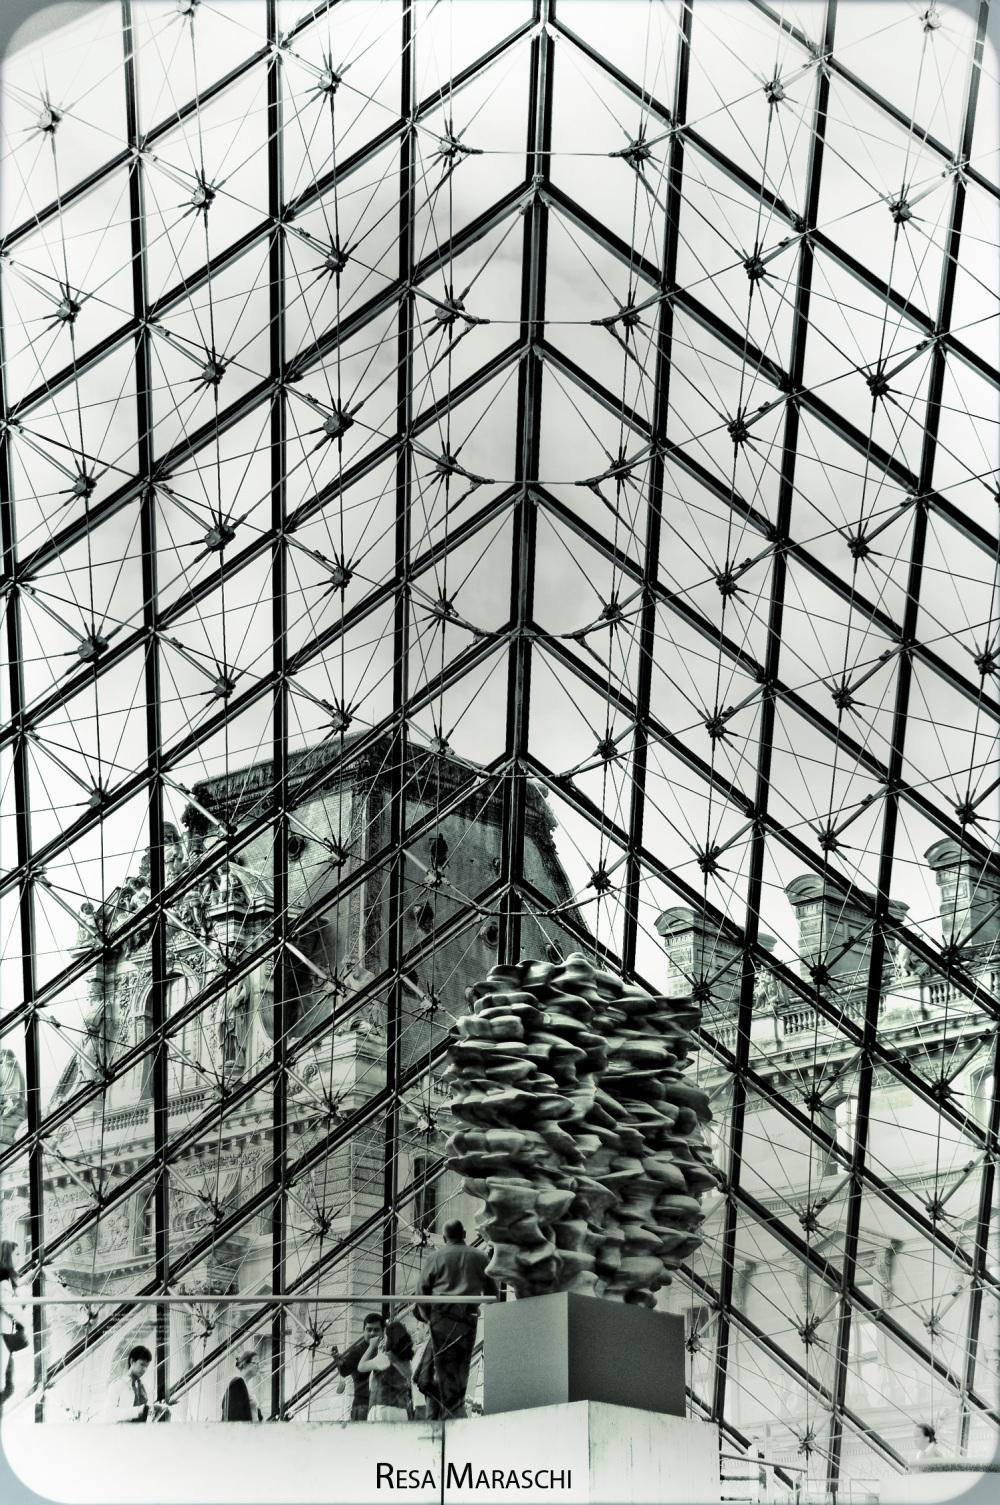 resa maraschi'sphoto foto paris Louvre Museum cano